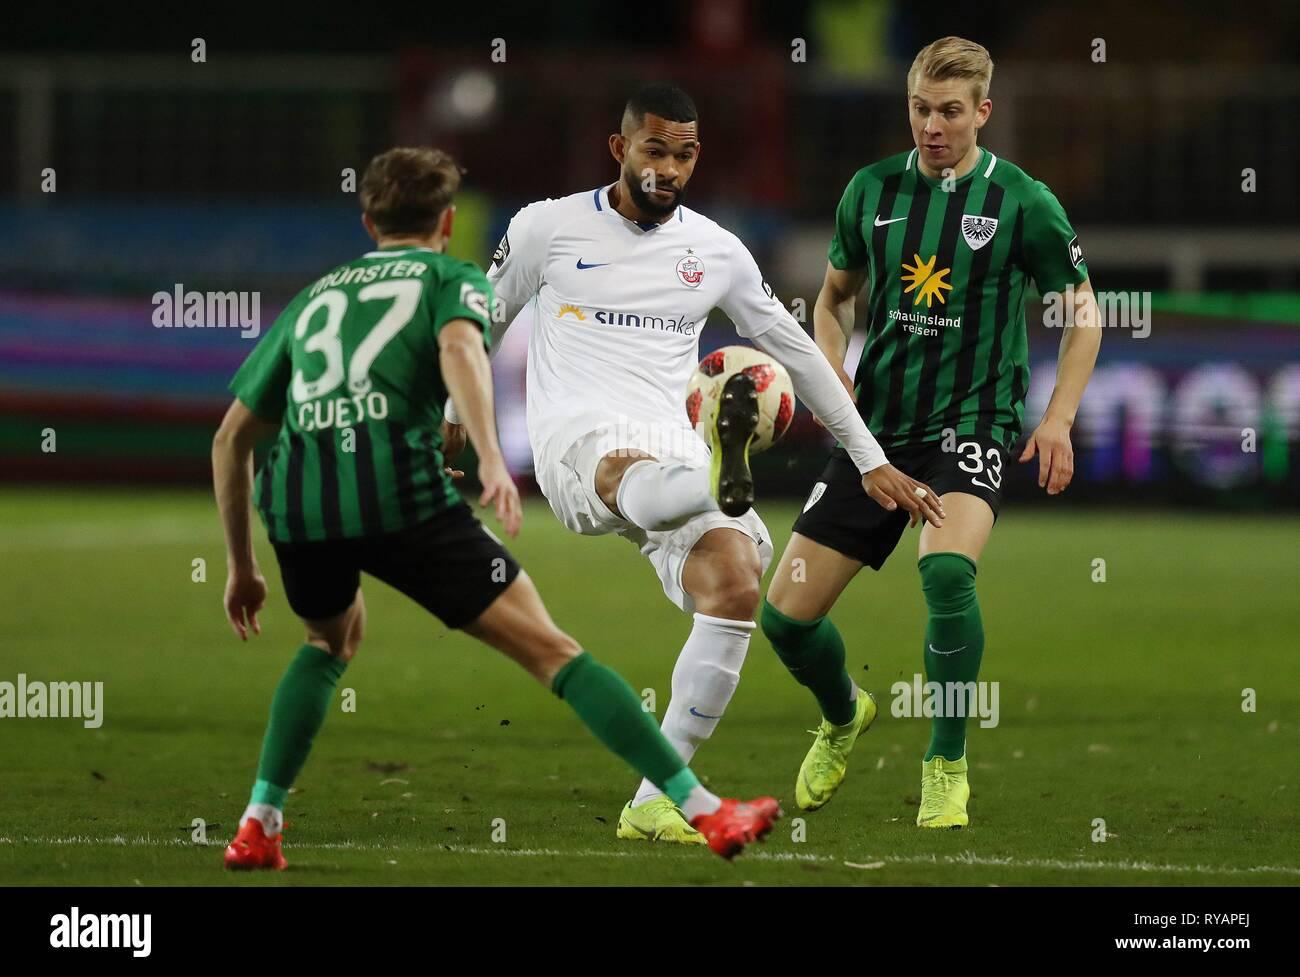 firo: 12.03.2019, Football, 2018/2019, 3.Bundesliga SC Preussen, Prussia Muenster Munster - Hansa Rostock 0: 1 duels, Cebio Soukou | usage worldwide - Stock Image